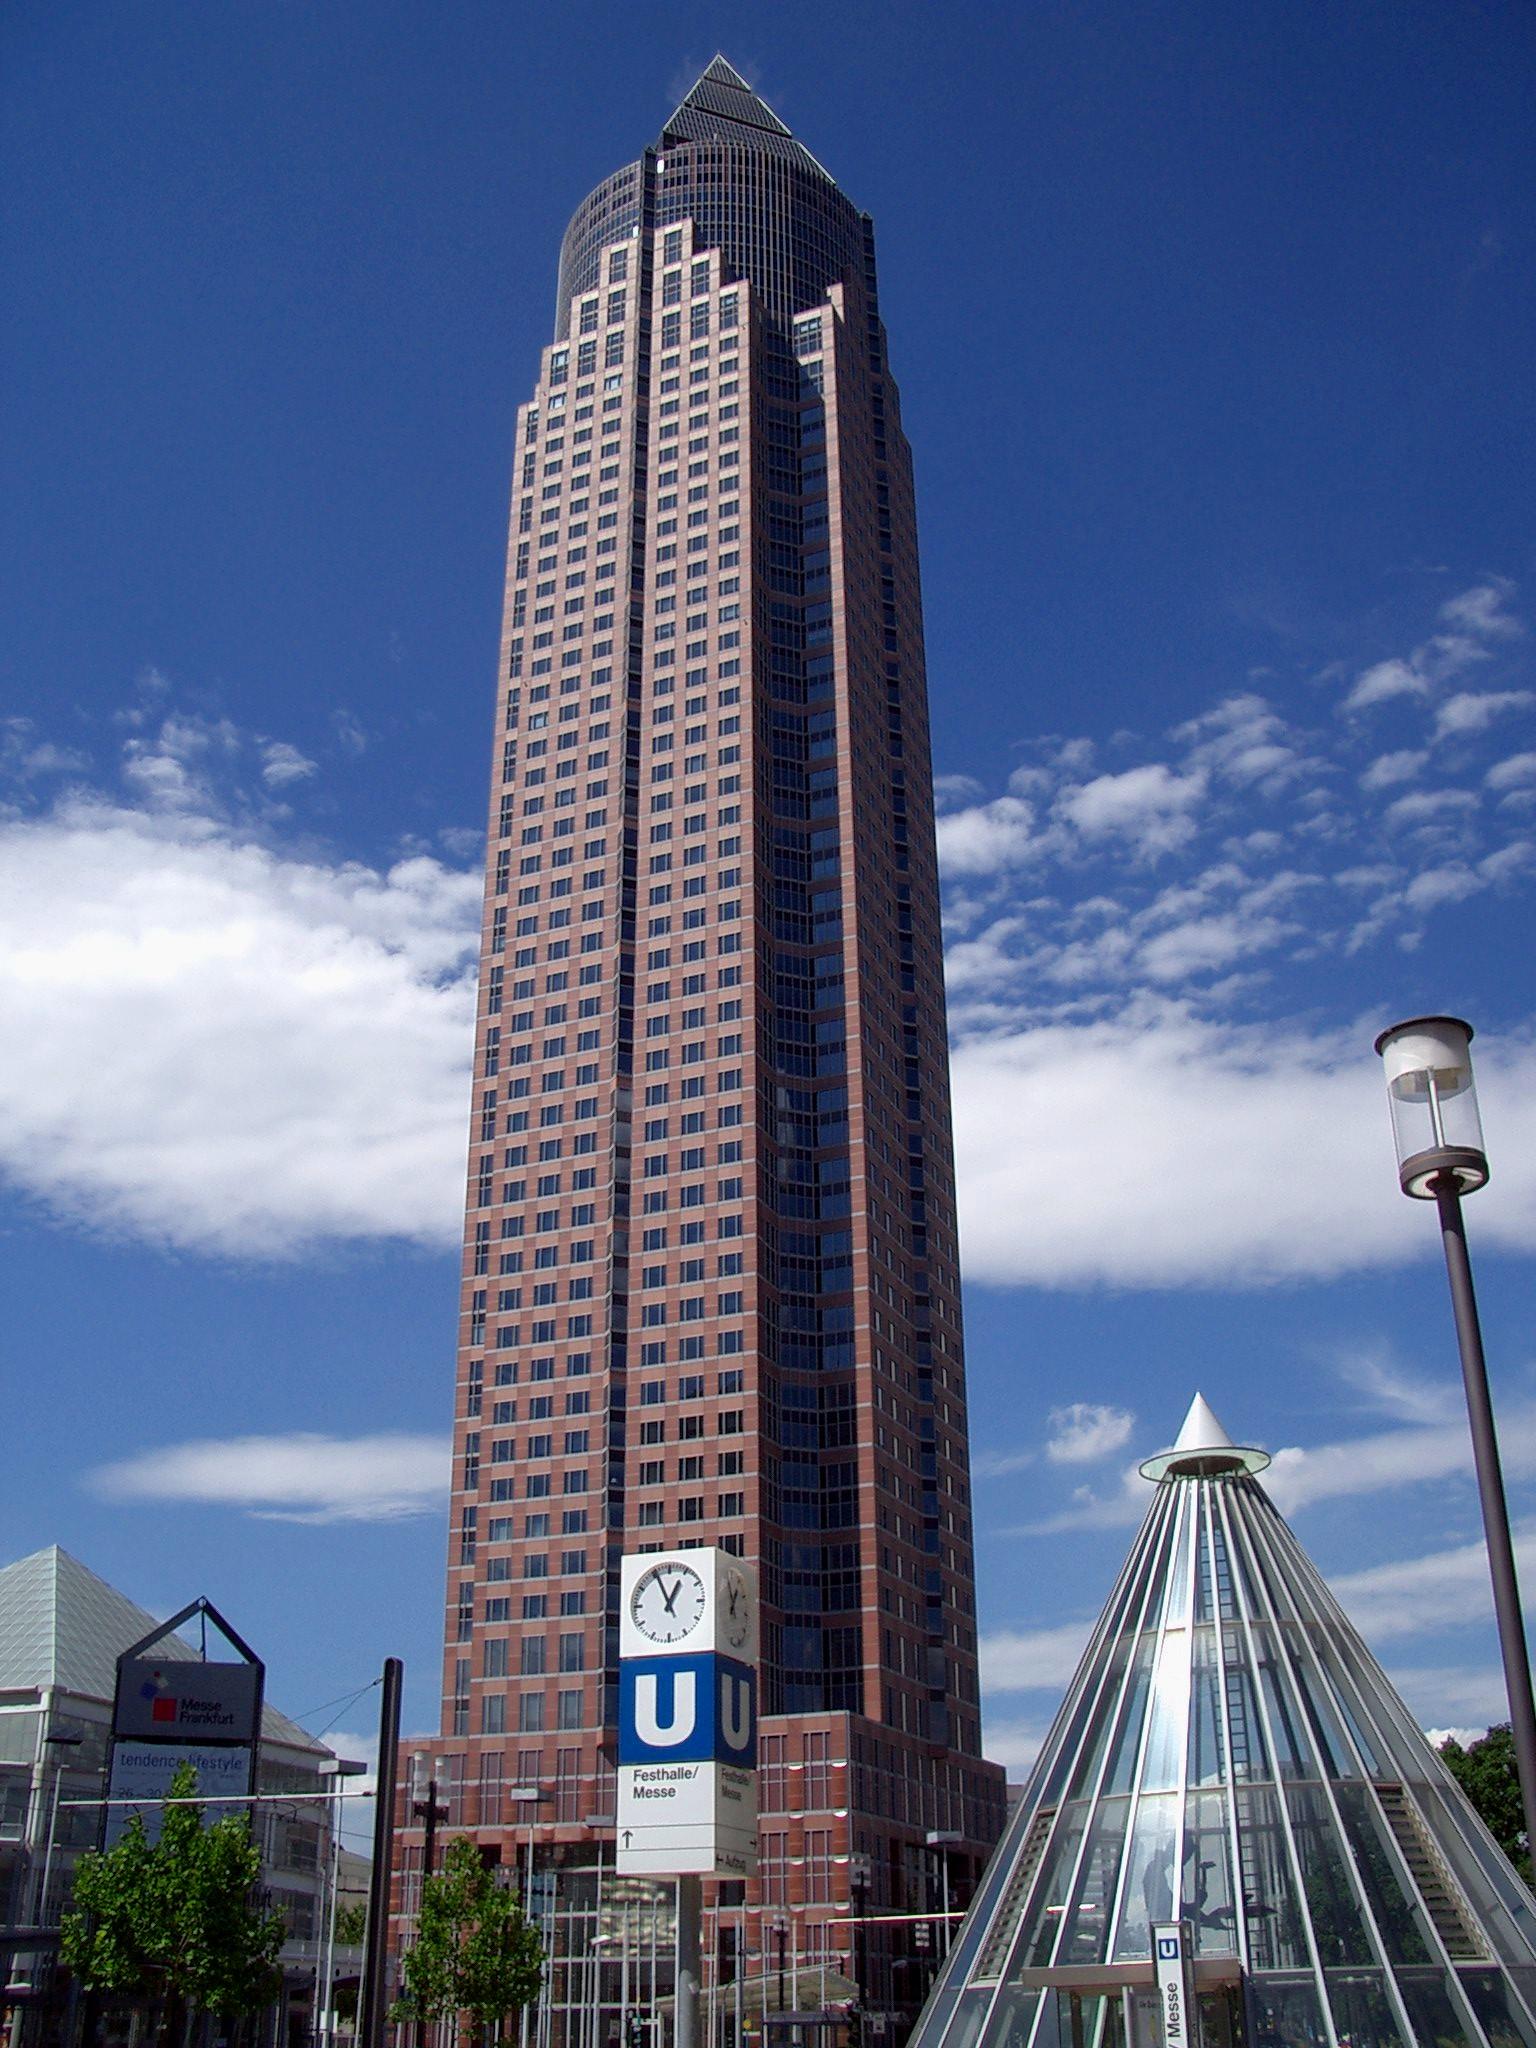 Messeturm wikipedia den frie encyklop di for Architecture post moderne